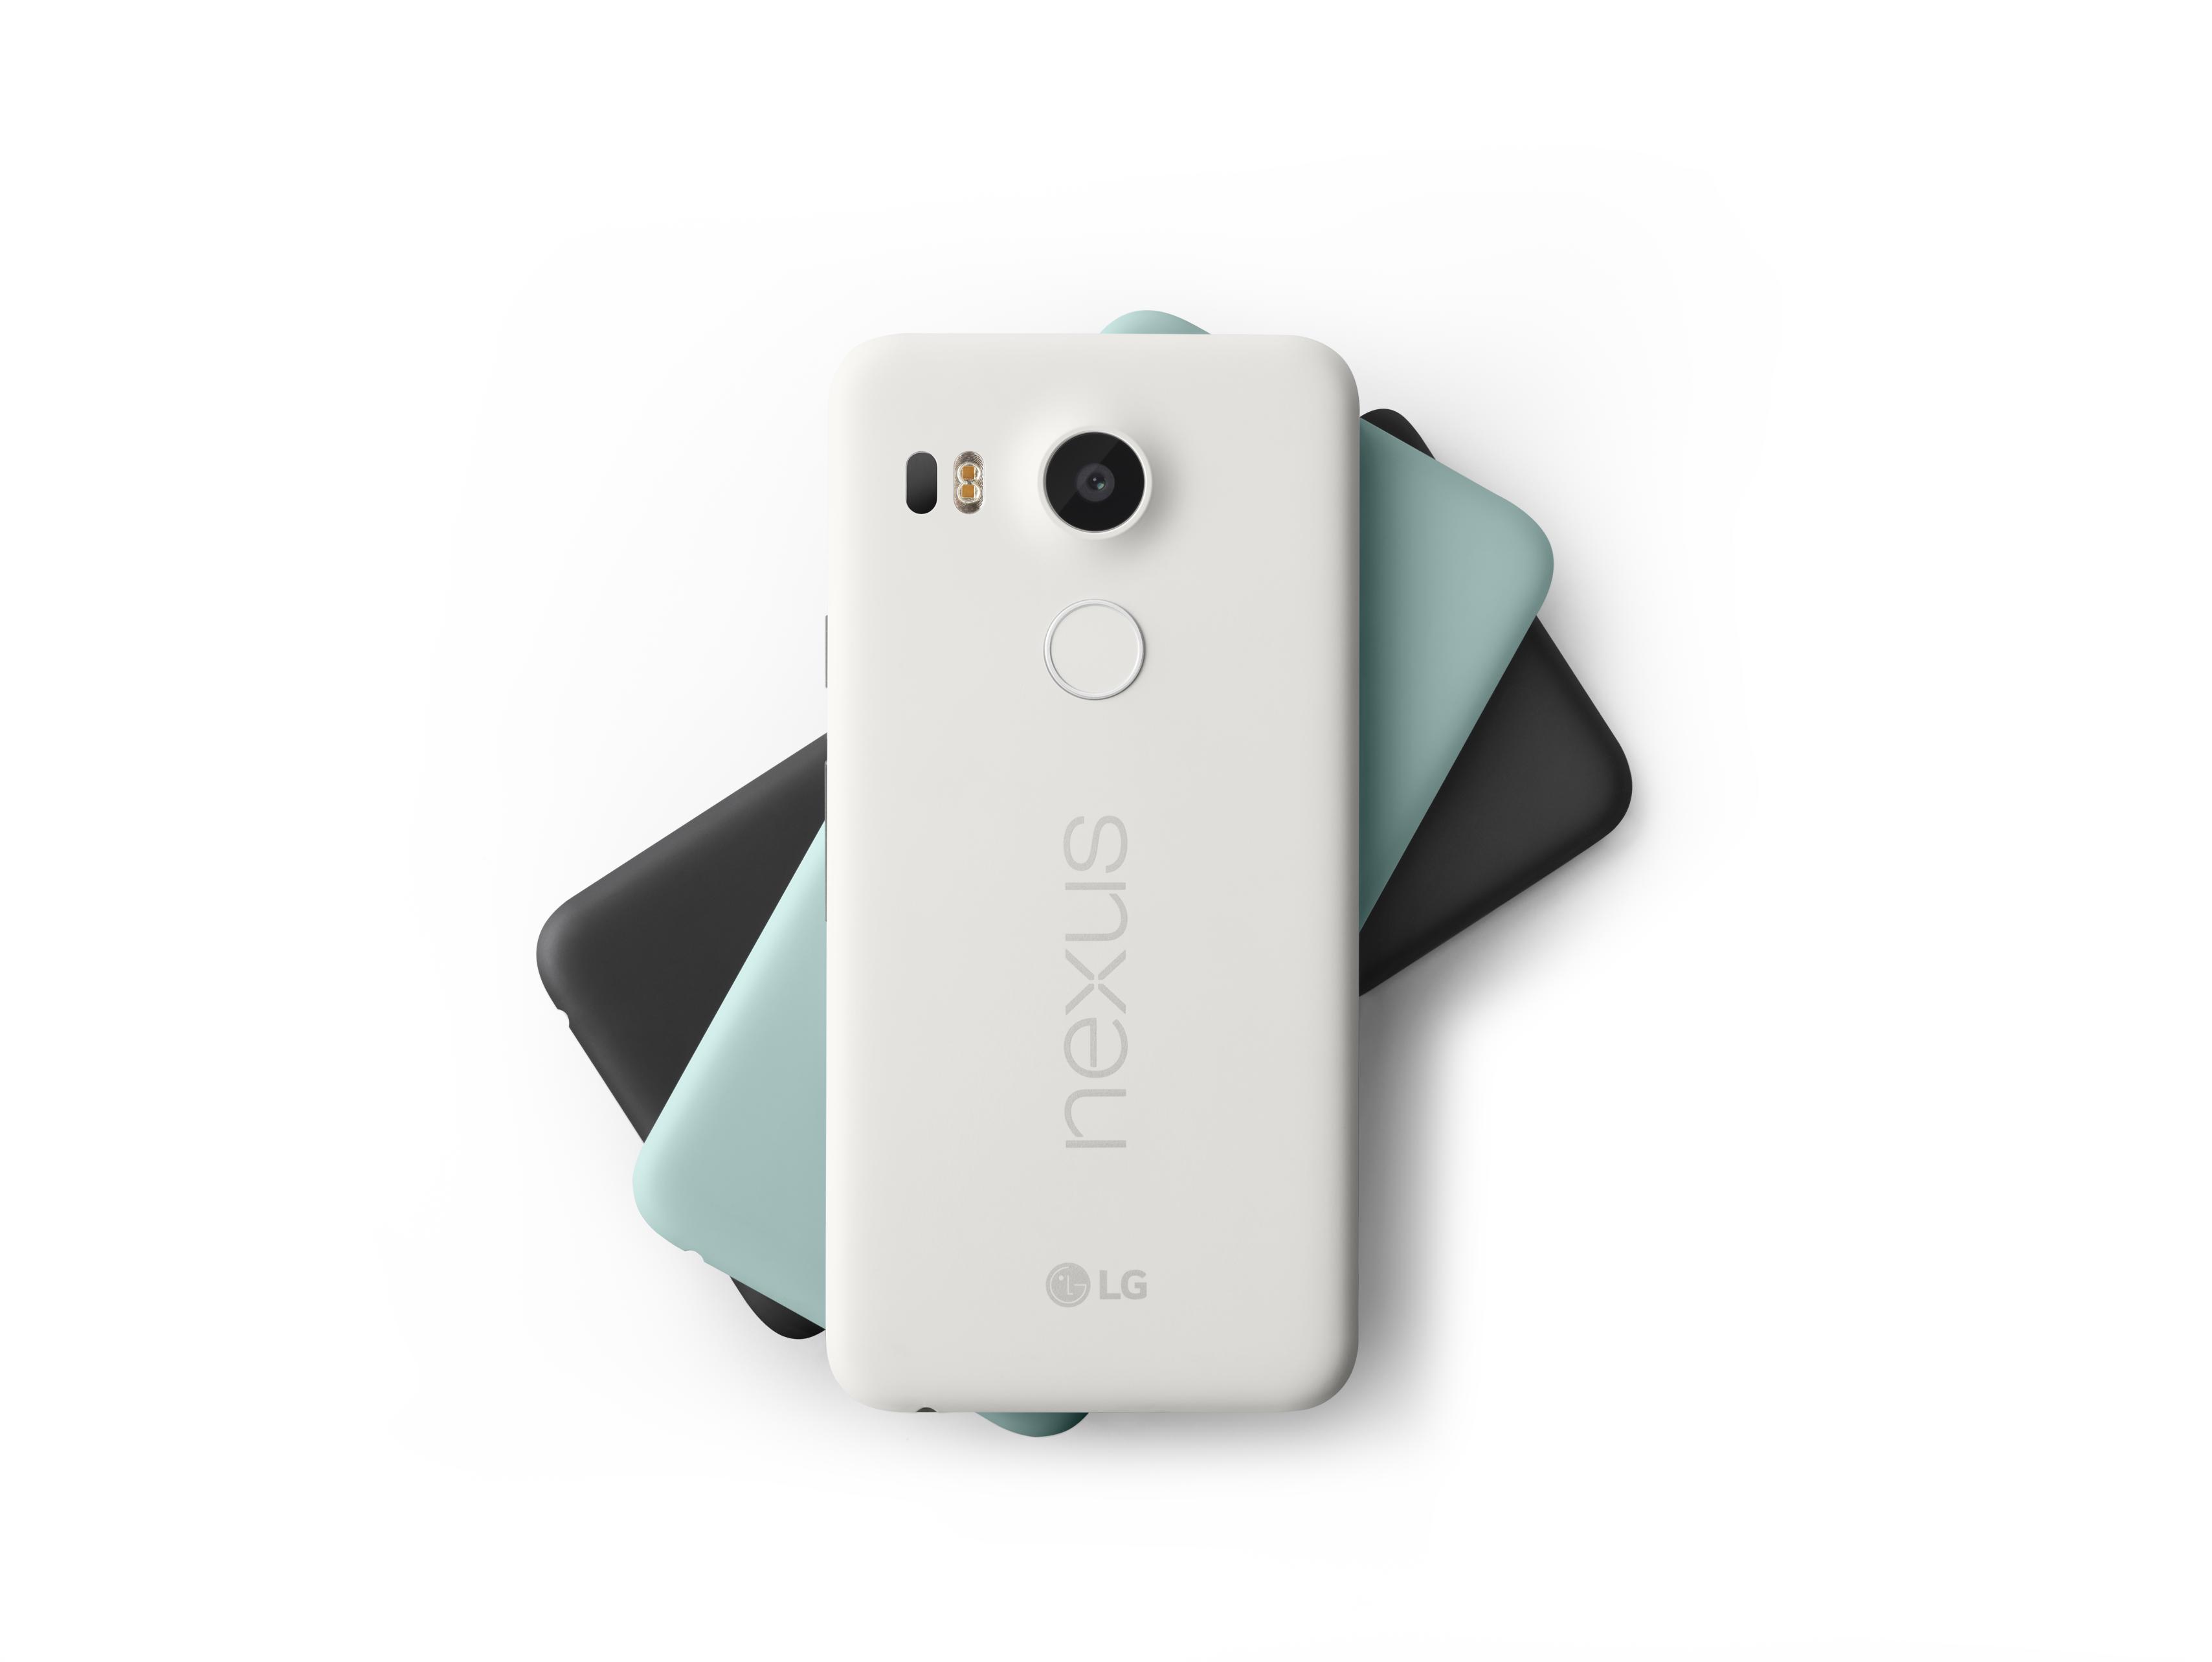 Google's Nexus 5X.